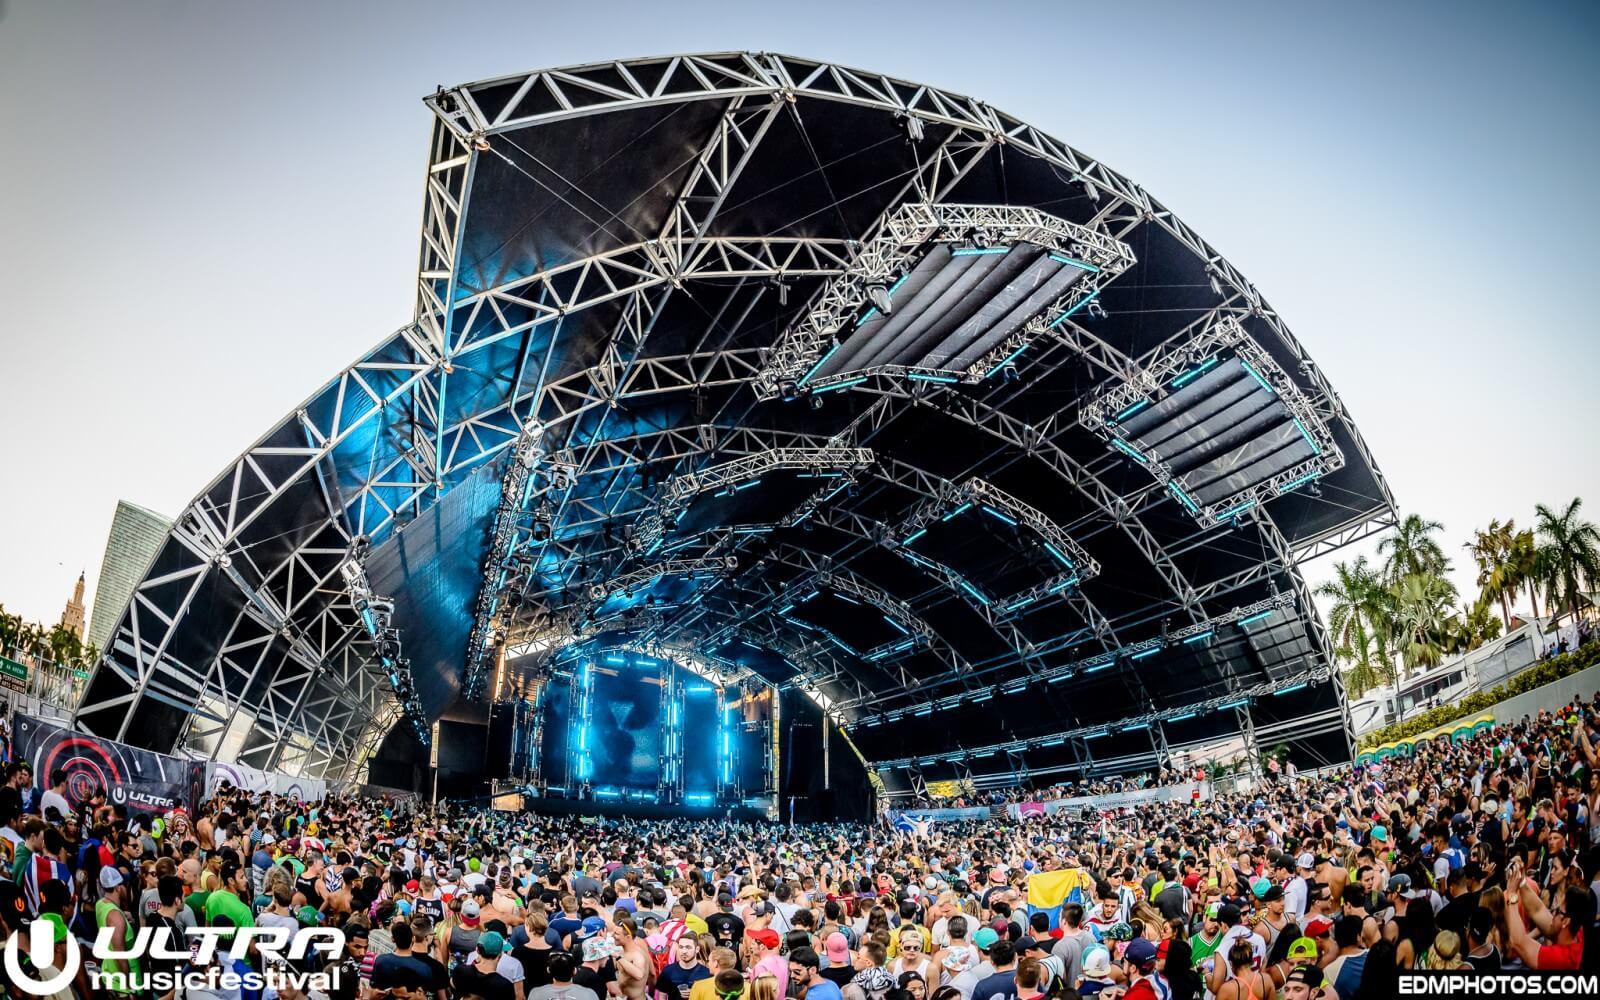 Gallery Ultra Music Festival